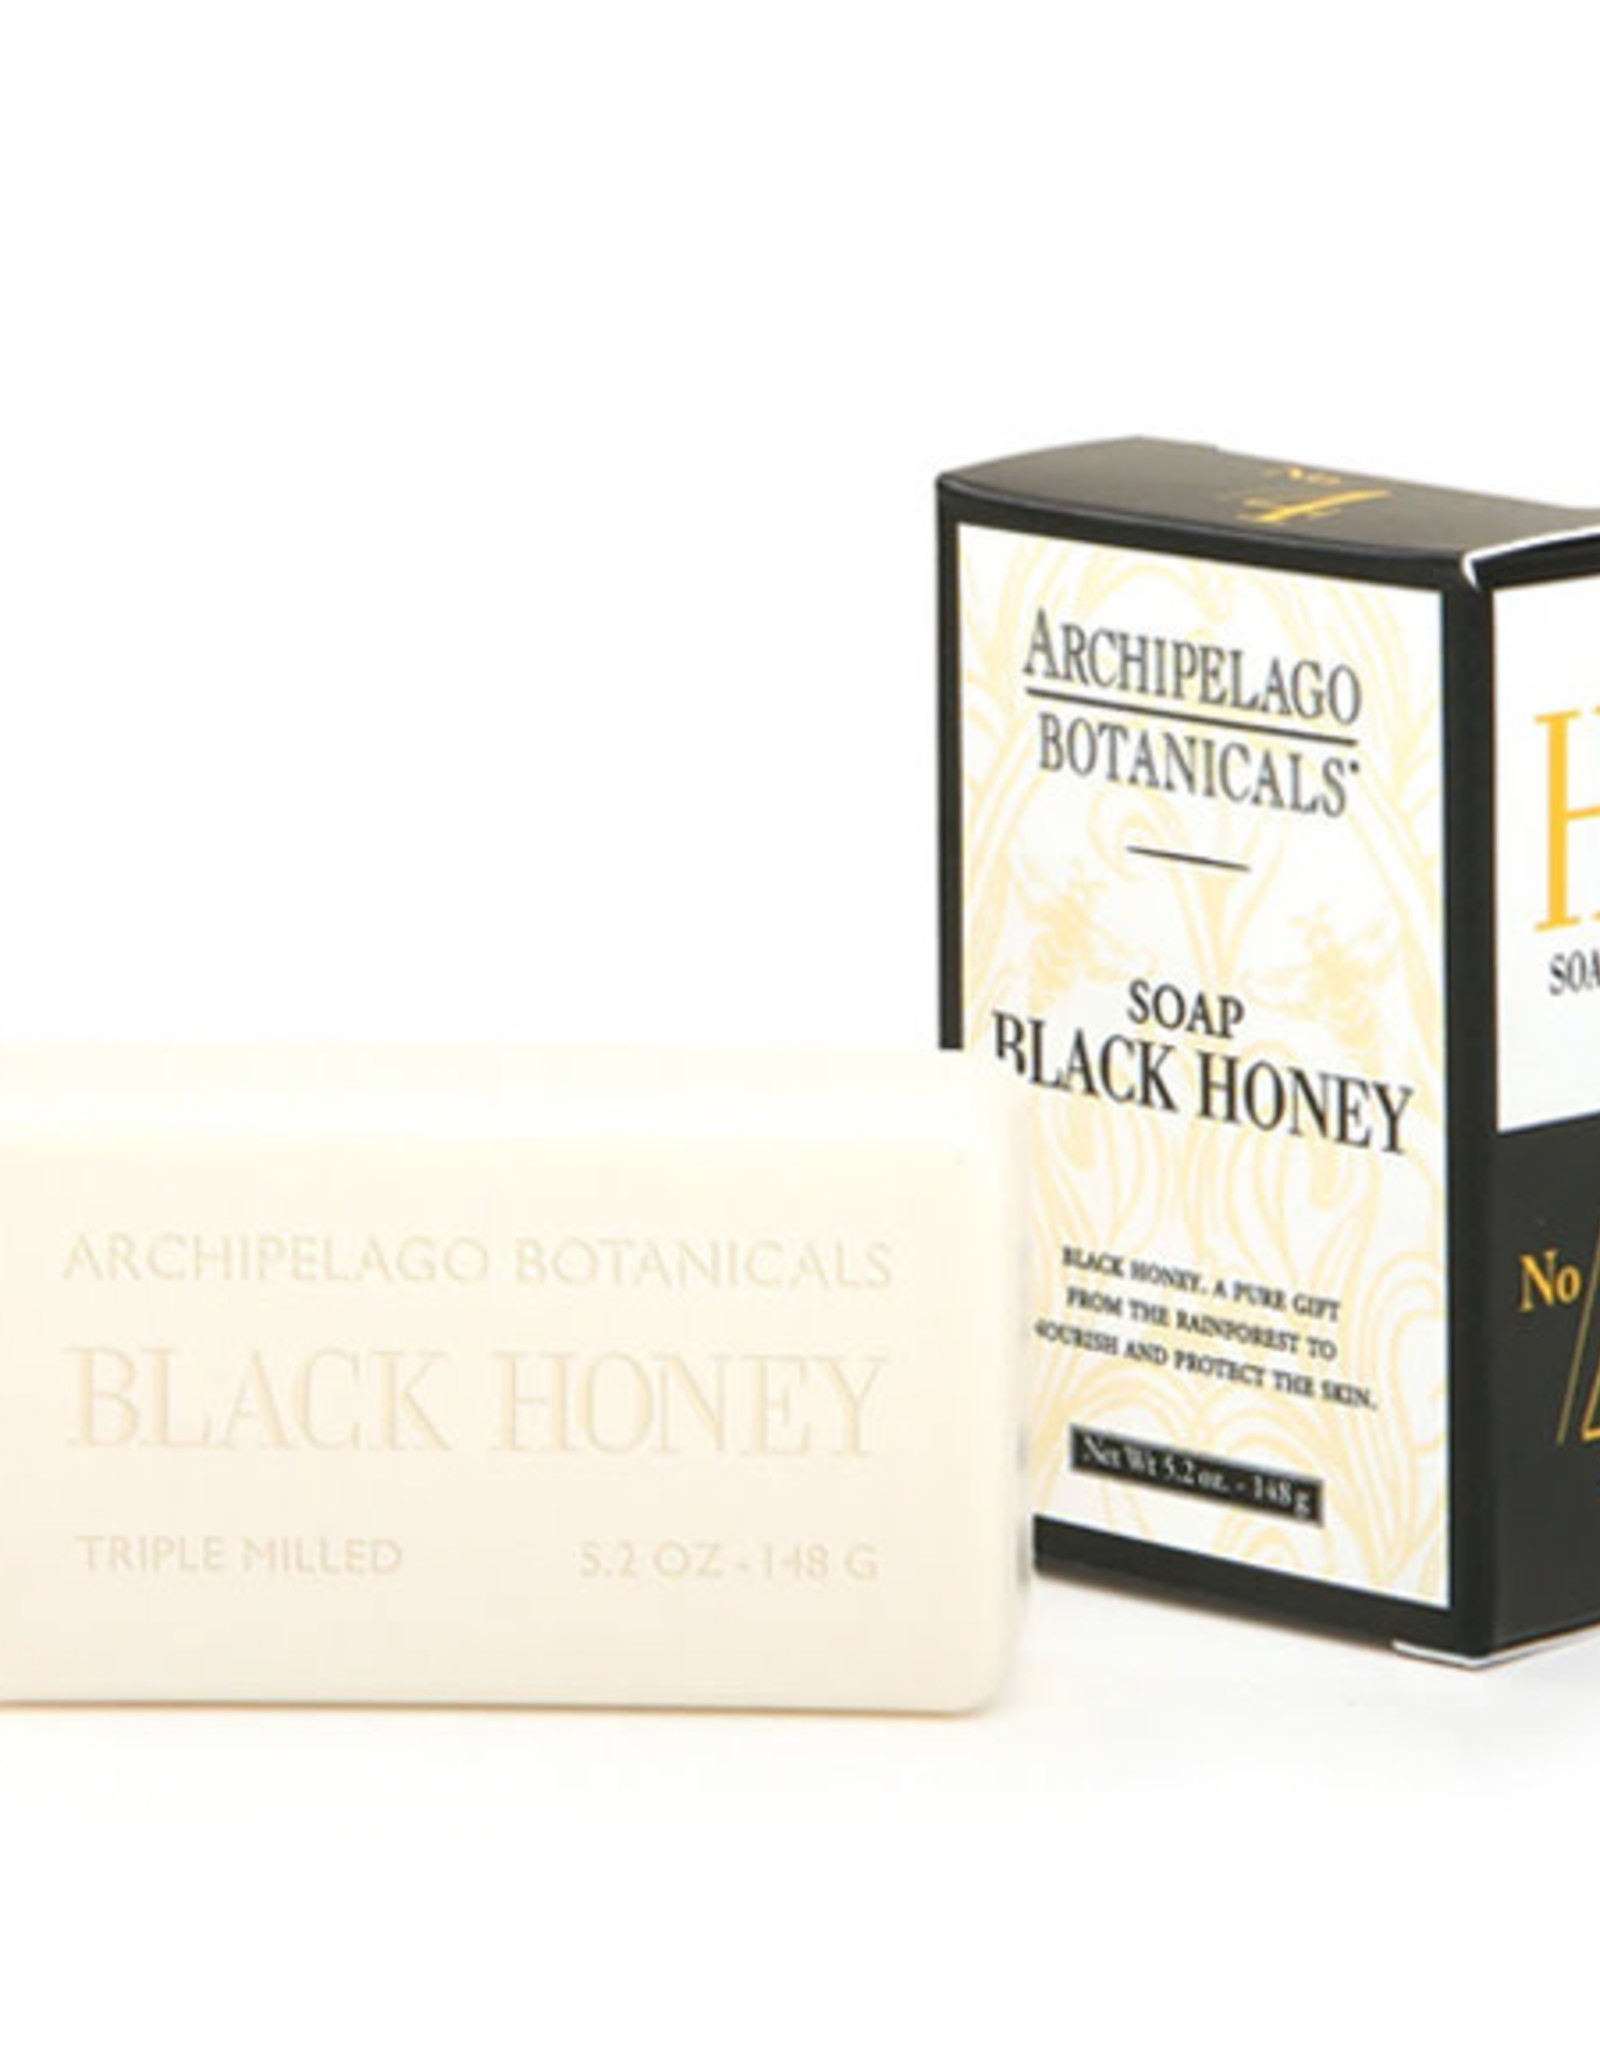 Black Honey Soap